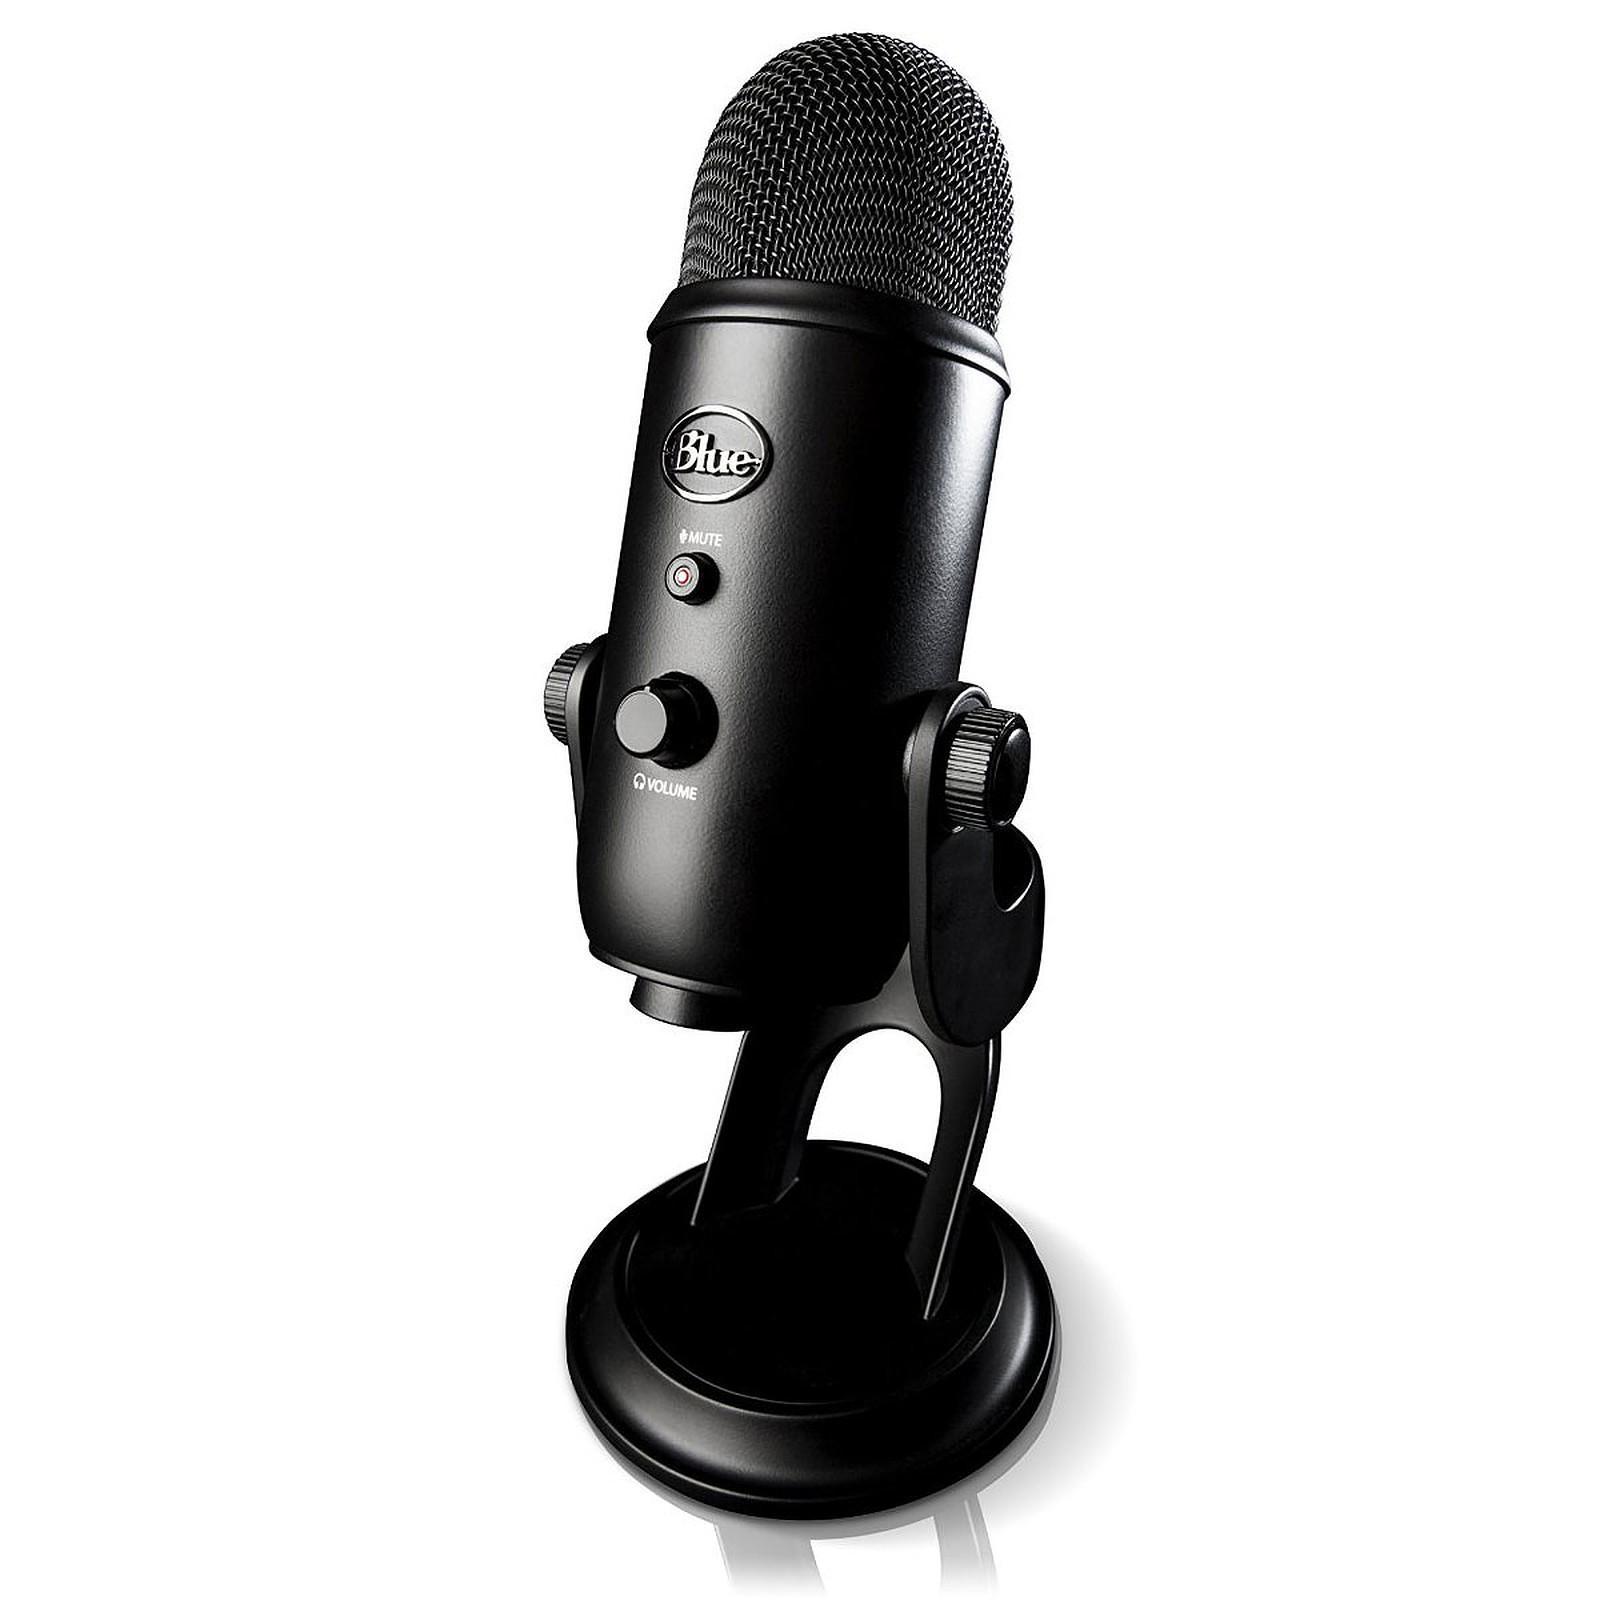 Blue Yeti Blackout Audio accessories